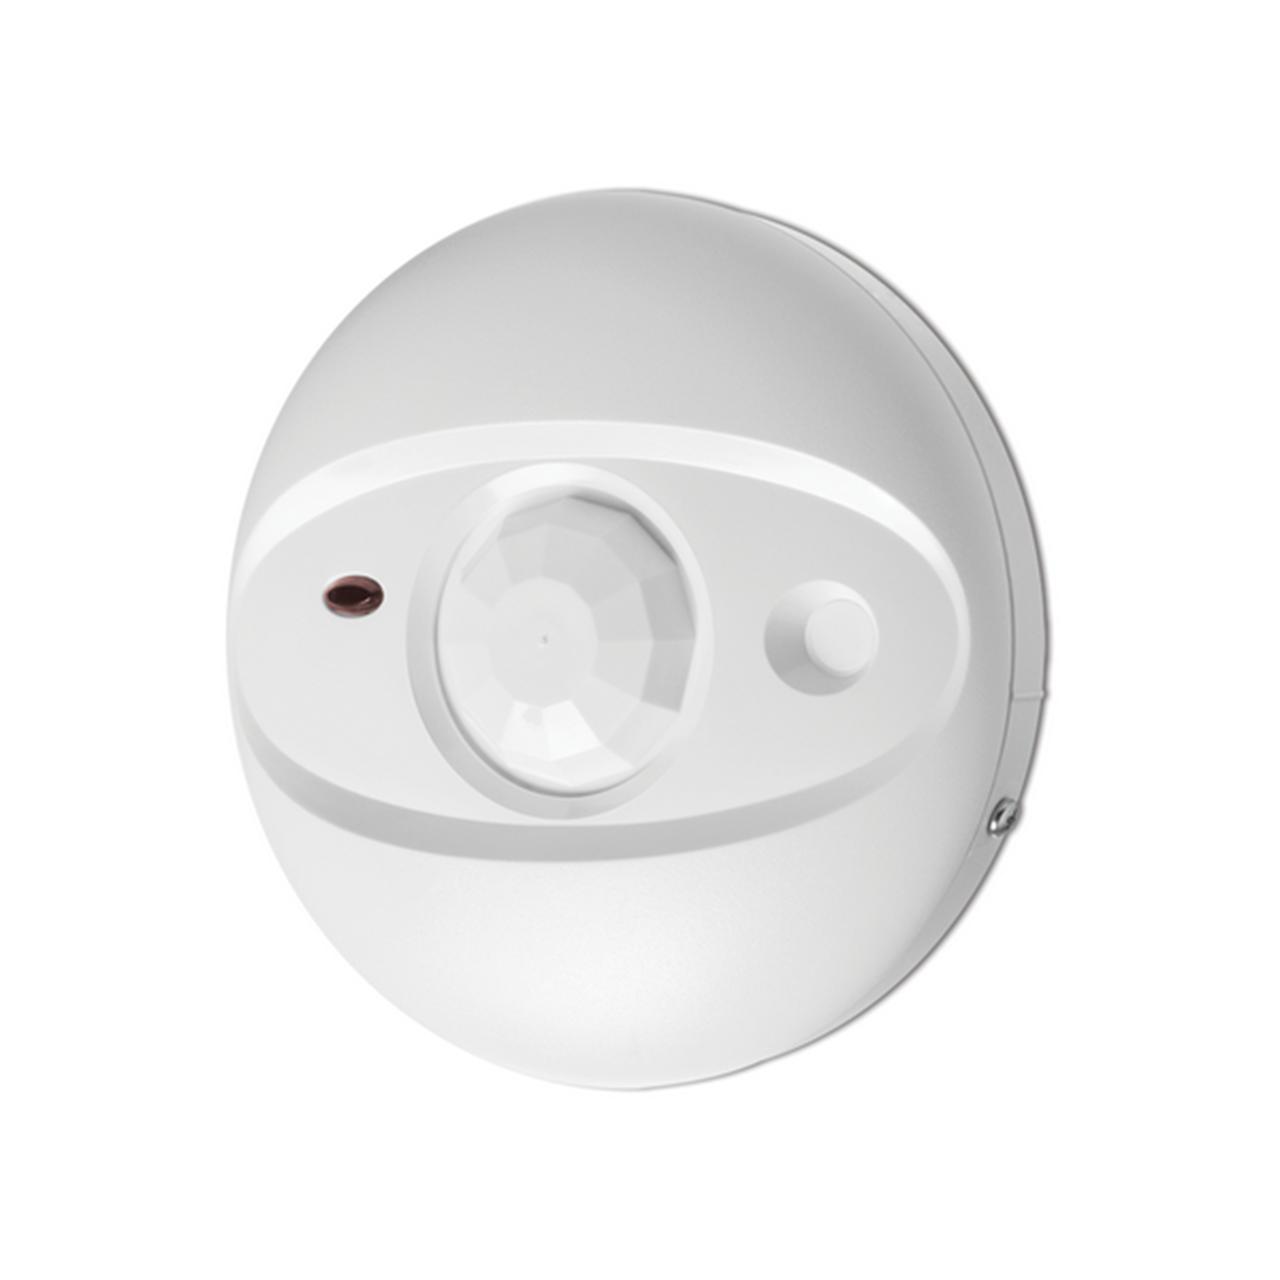 Bentel security IR360 - Ceiling-mount PIR Detector  Armenia Vantag